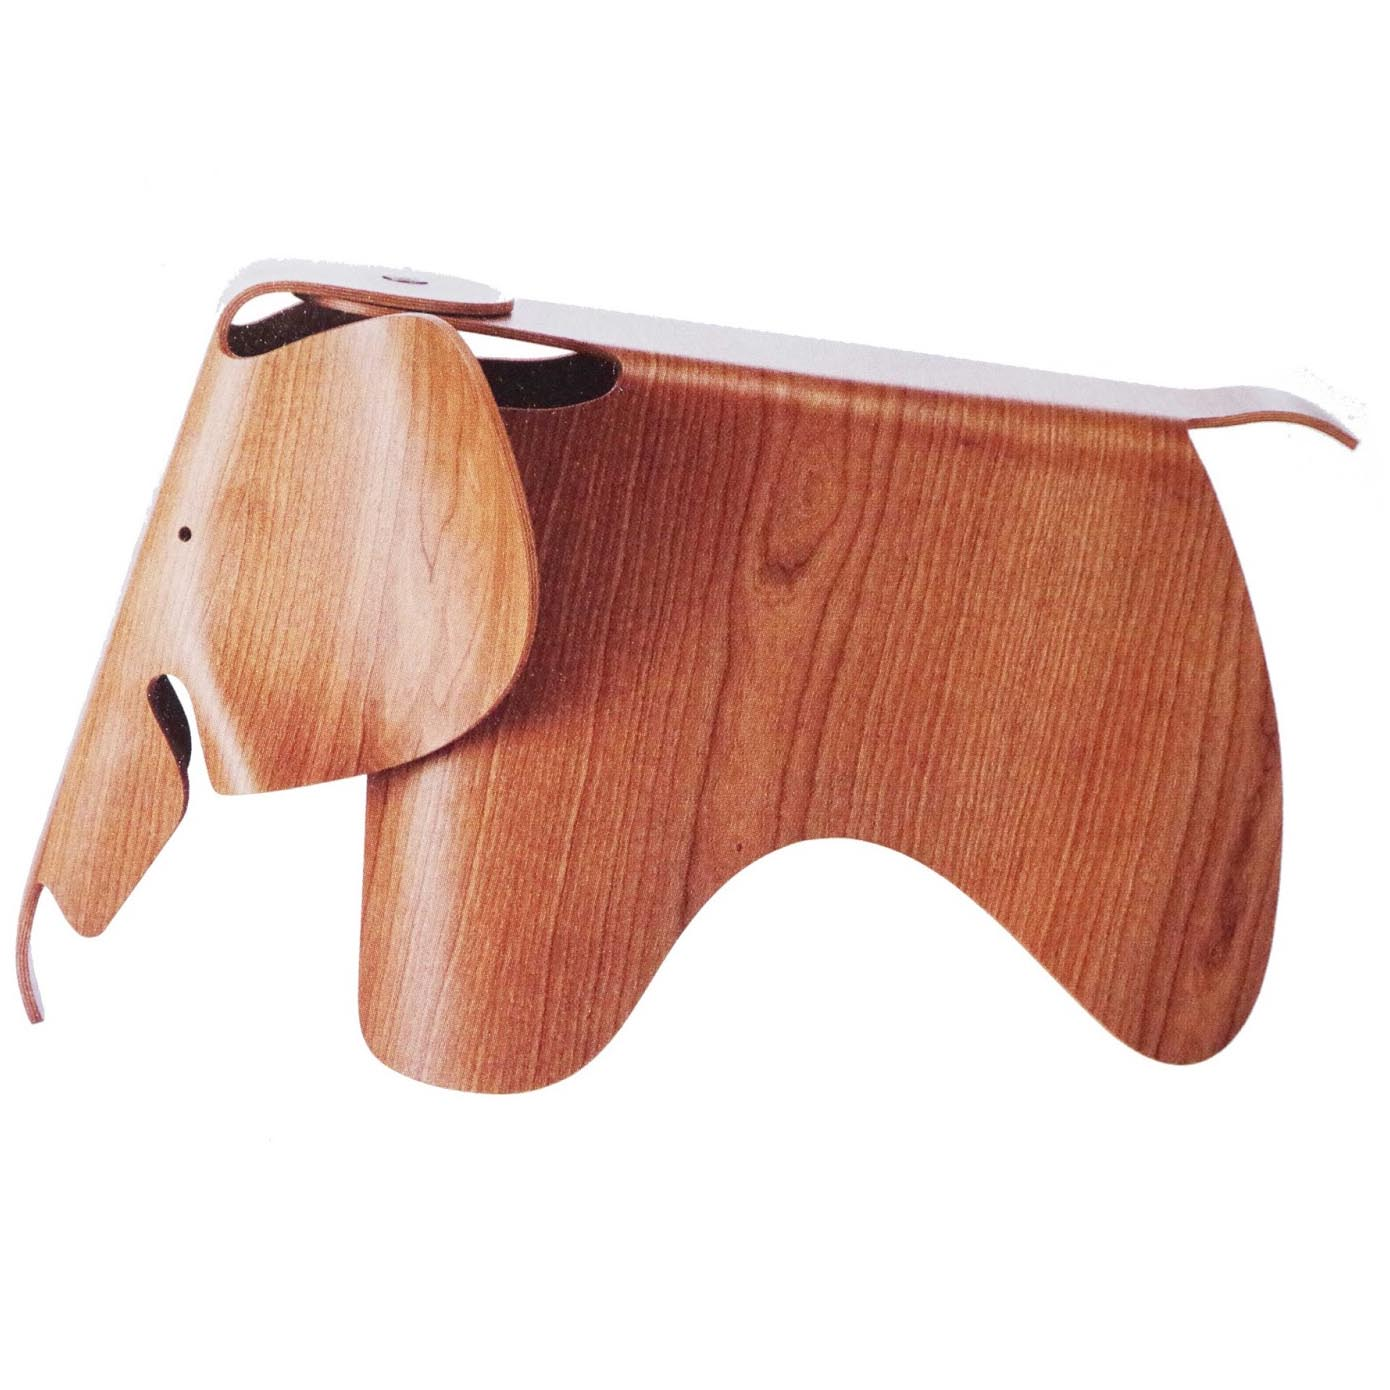 Vitra ヴィトラ Eames Plywood Elephant イームズプライウッドエレファント